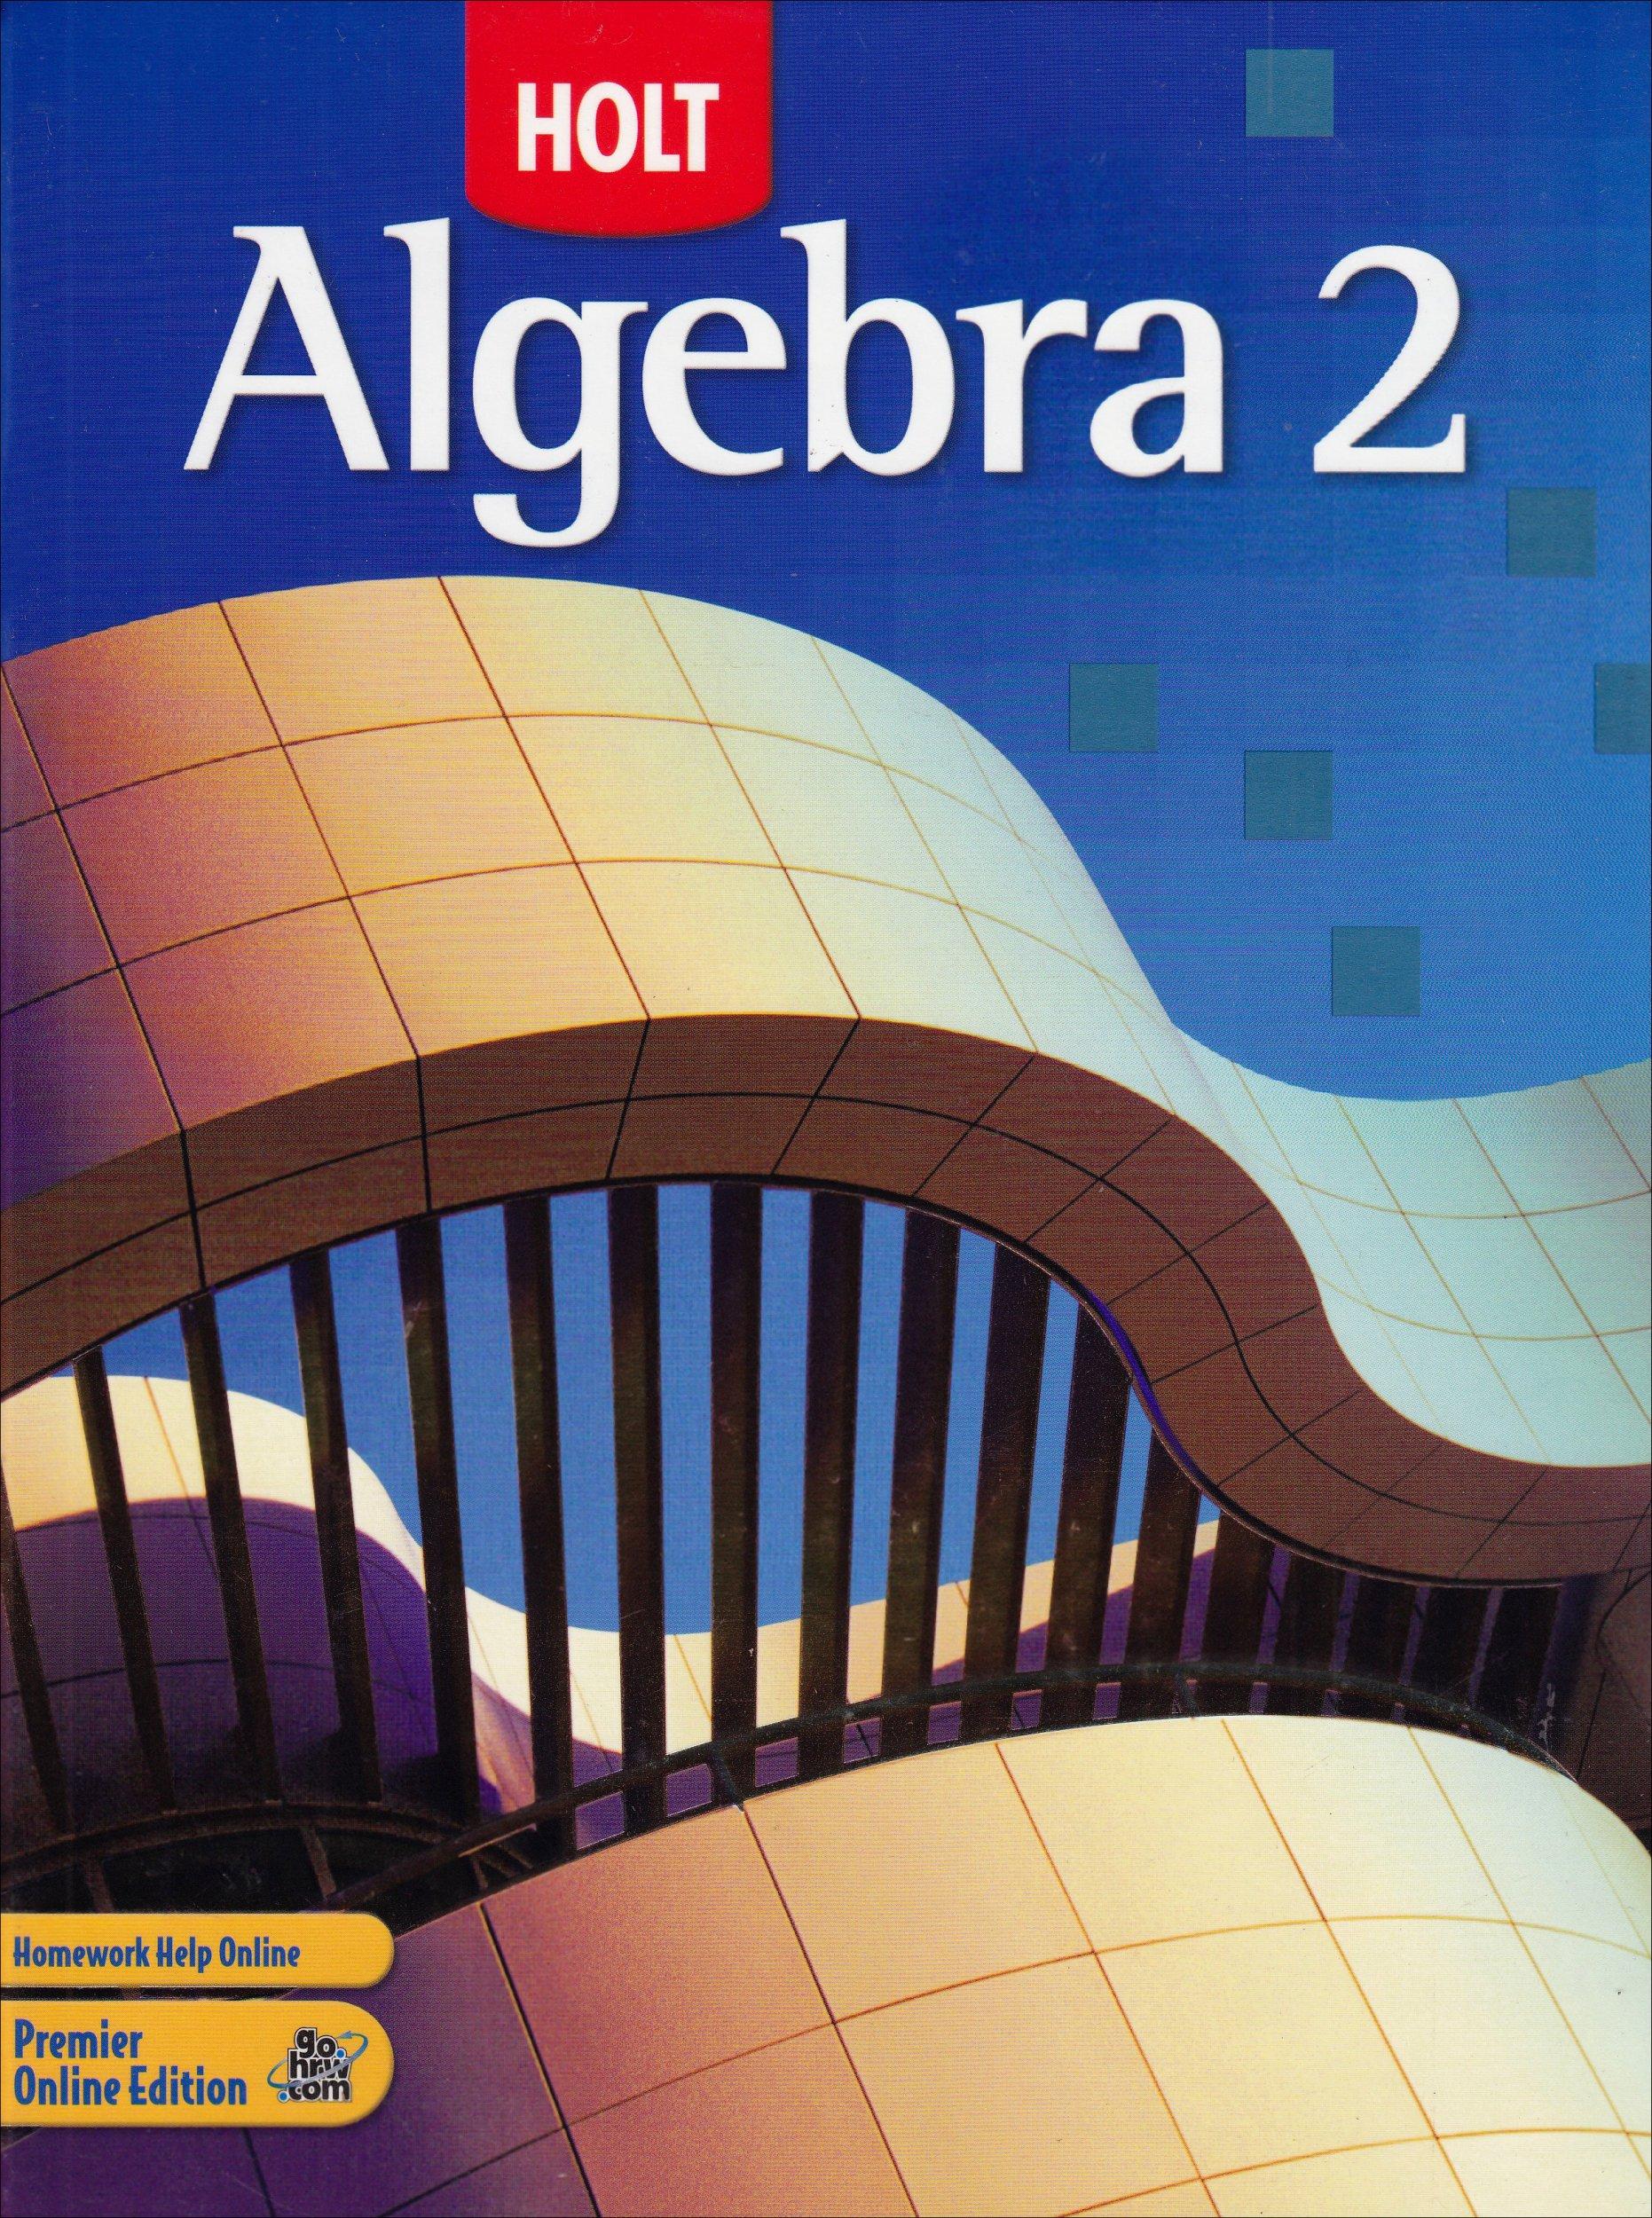 worksheet Holt Algebra 2 Worksheets buy algebra 2 grade 11 holt book online at low prices in india reviews rating